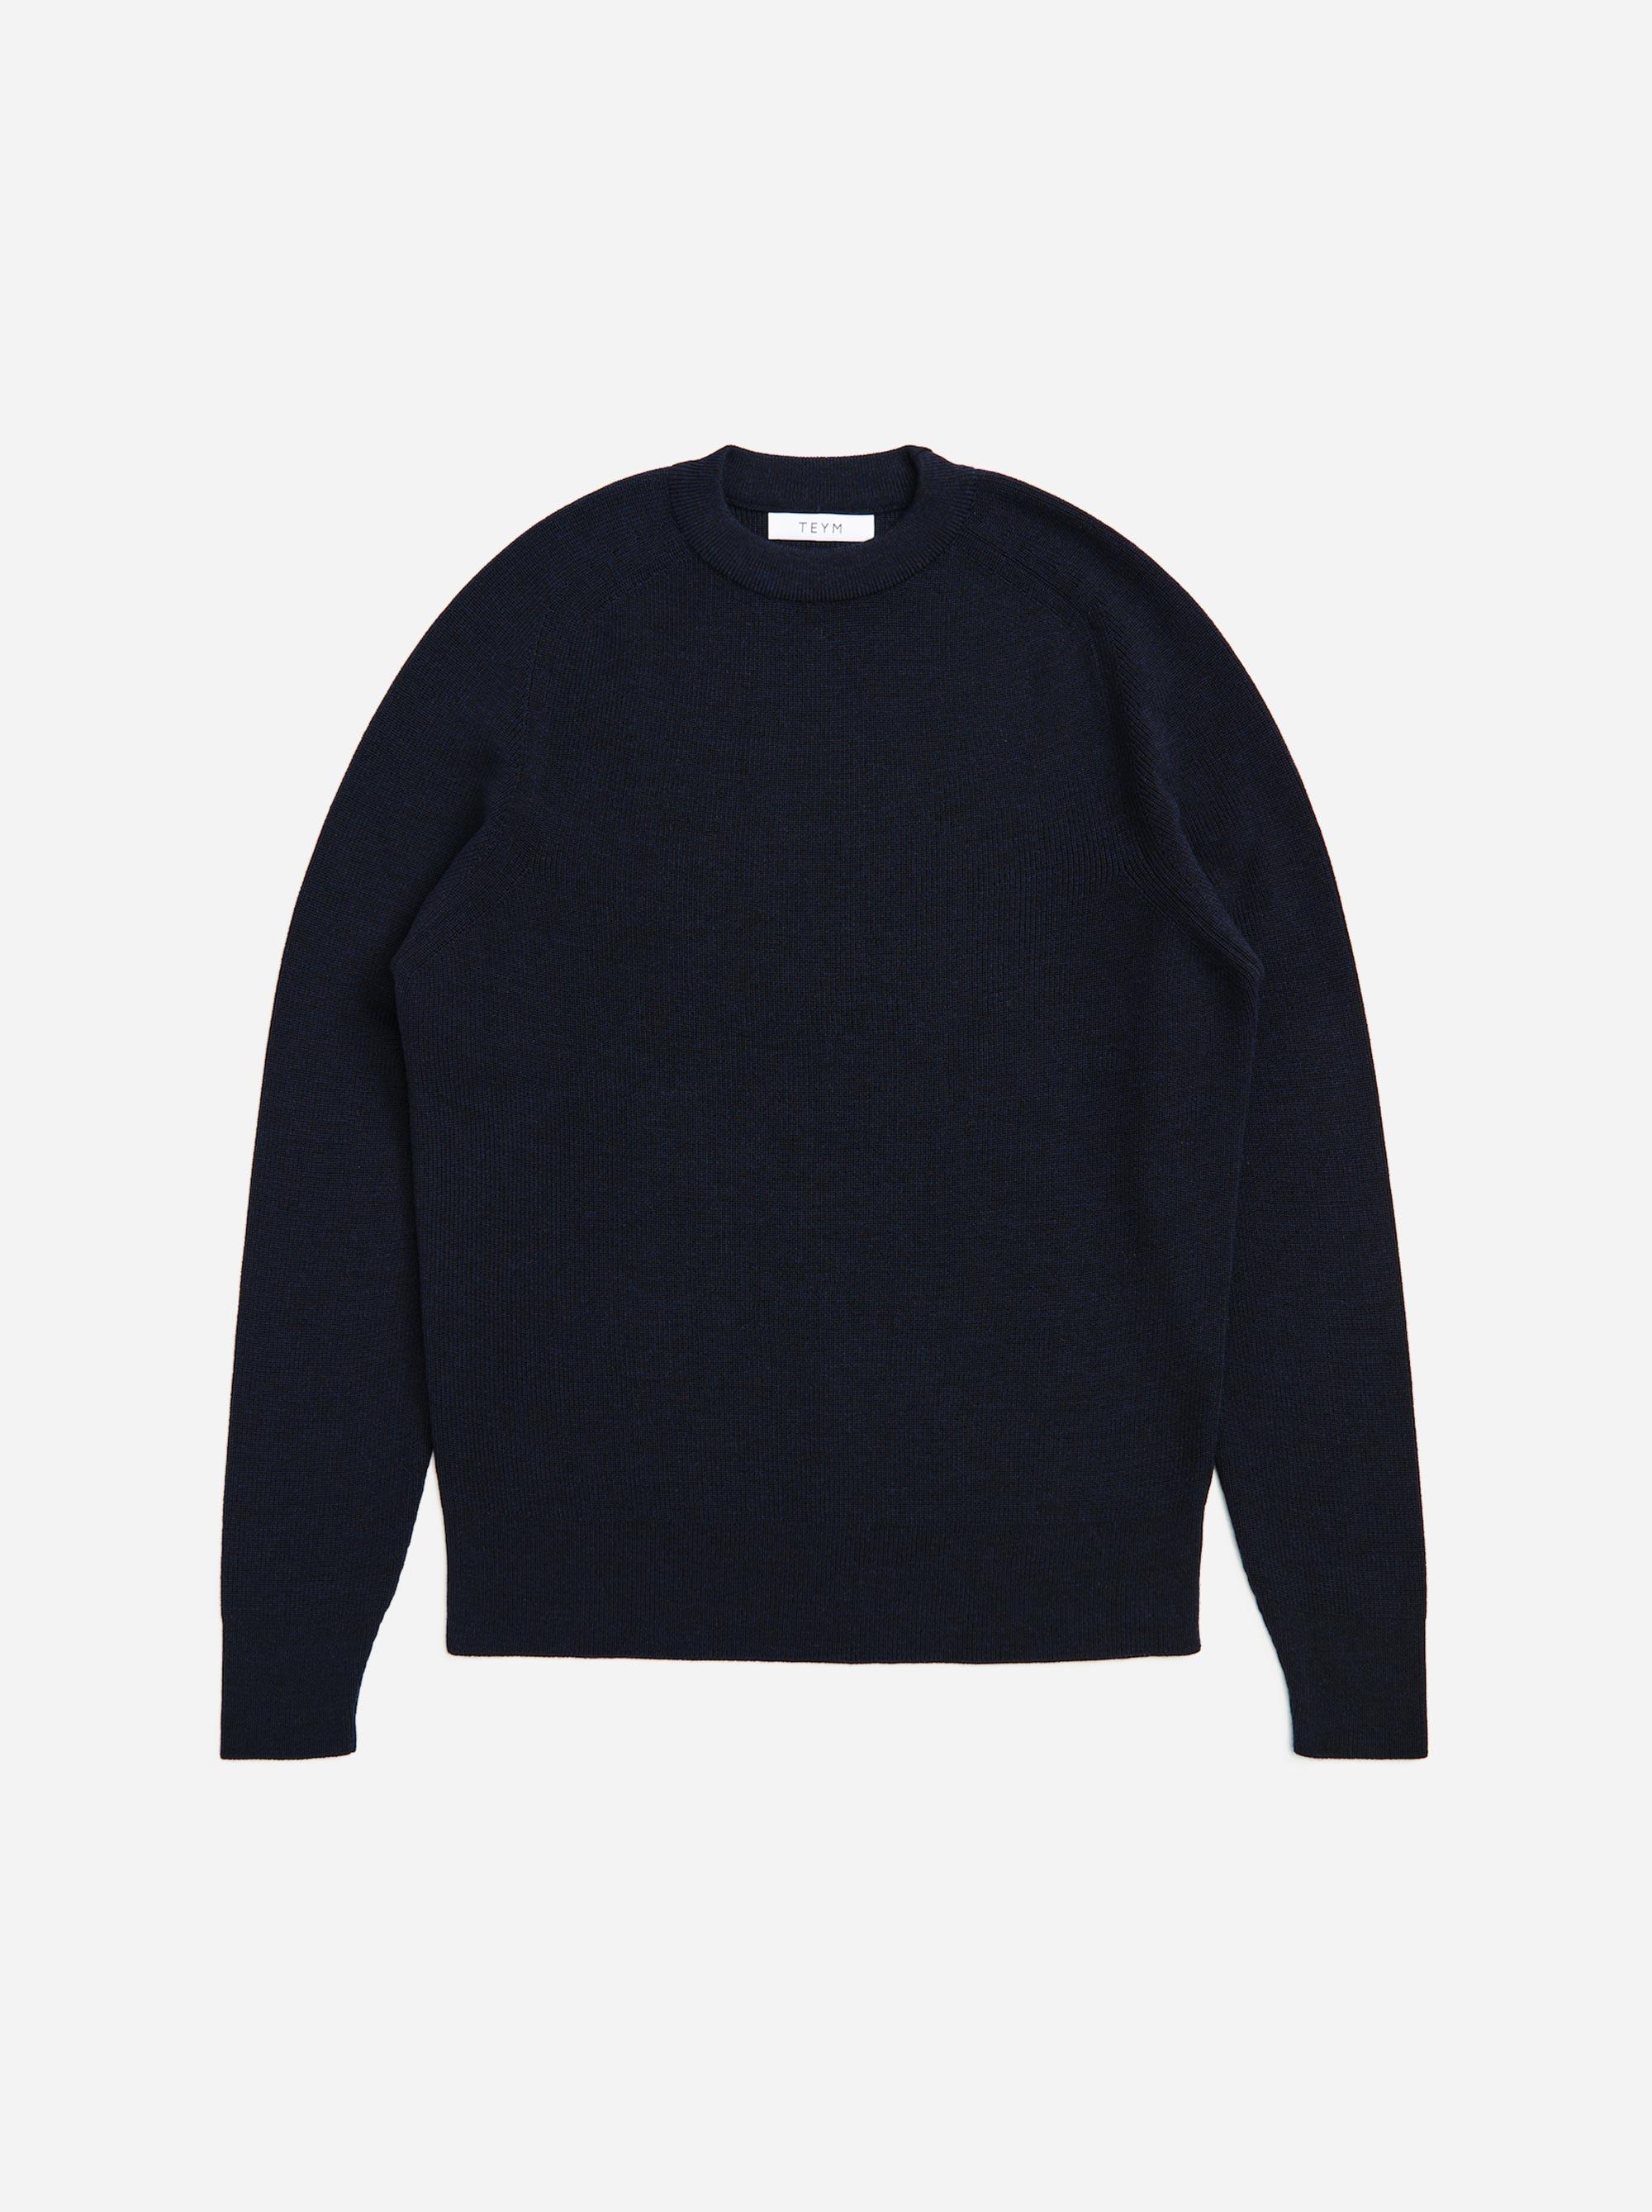 Teym - Crewneck - The Merino Sweater - Women - Blue - 4